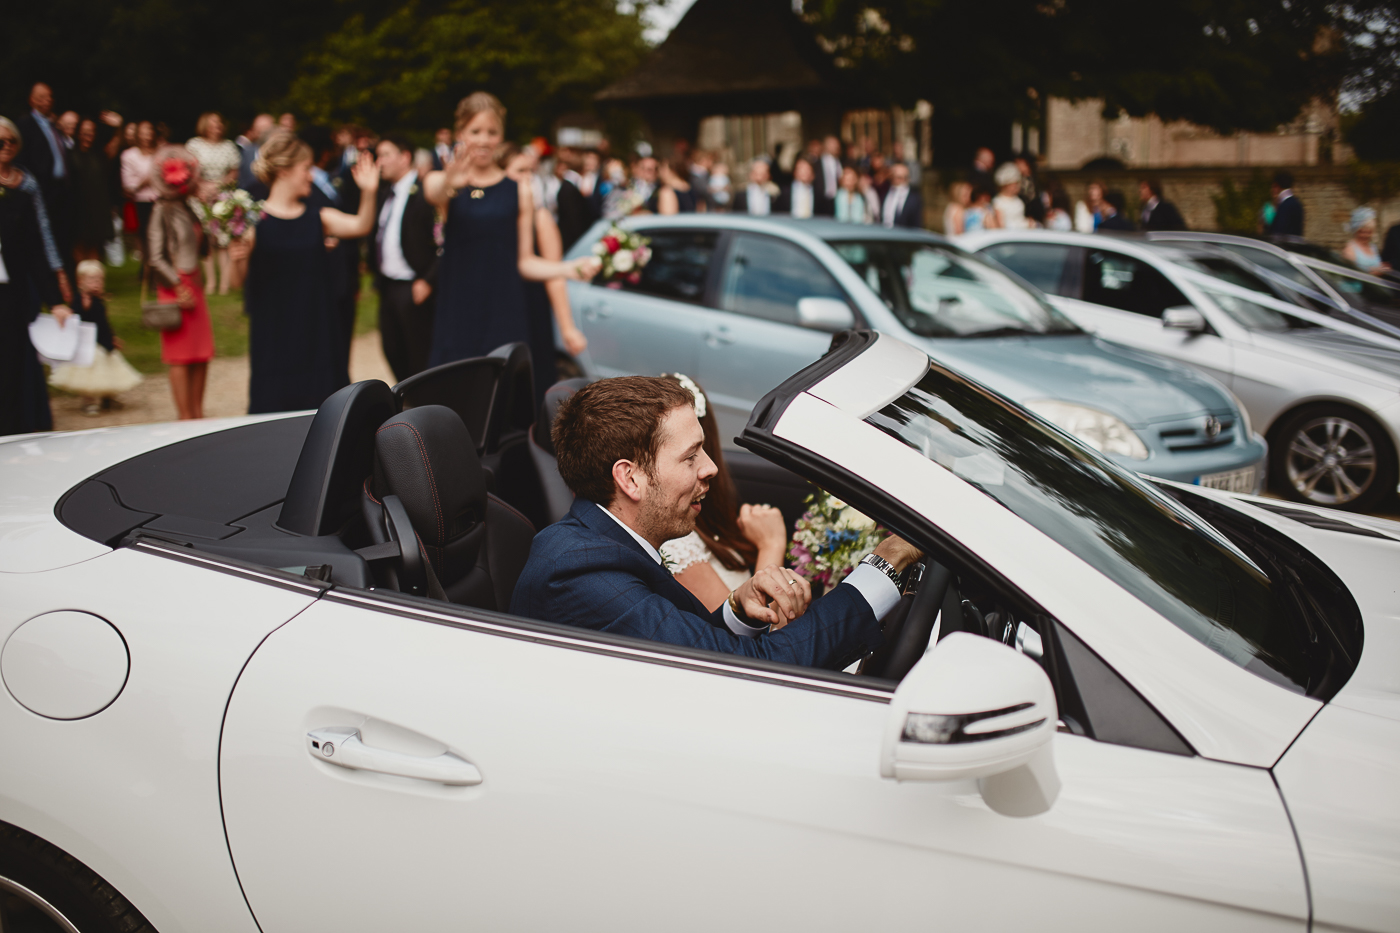 Danni_And_Jack_Gloucester_Wedding-83.jpg